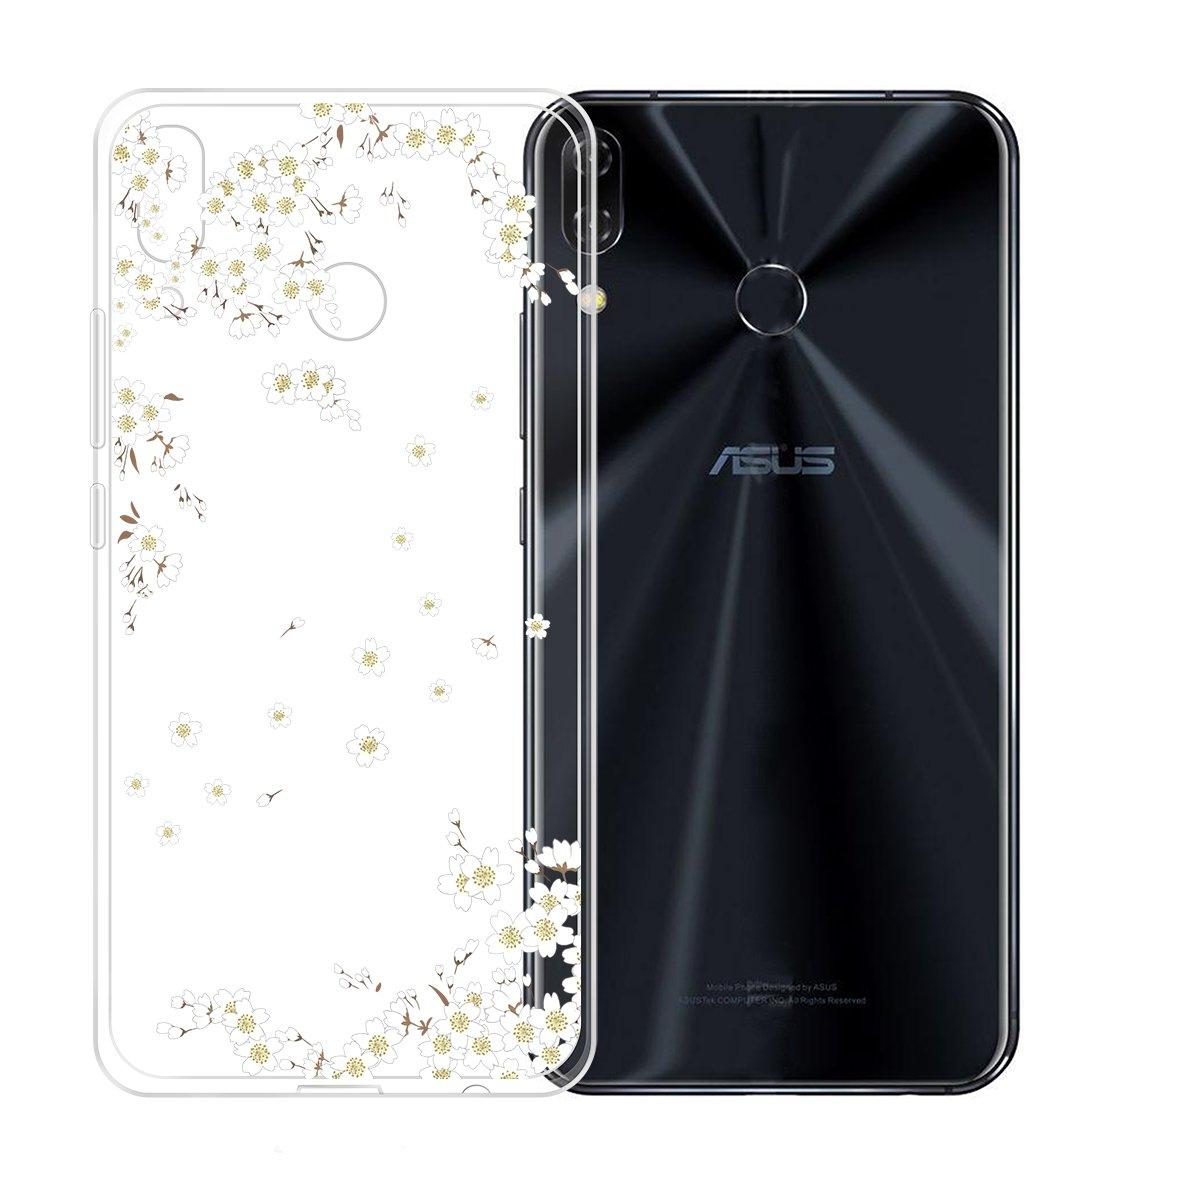 JIENI Funda Transparente TPU Suave Silicona Ramas Flor Parachoques Caso Carcasa Case Cover para ASUS Zenfone 5Z ZS620KL / Zenfone 5 ZE620KL (6.2